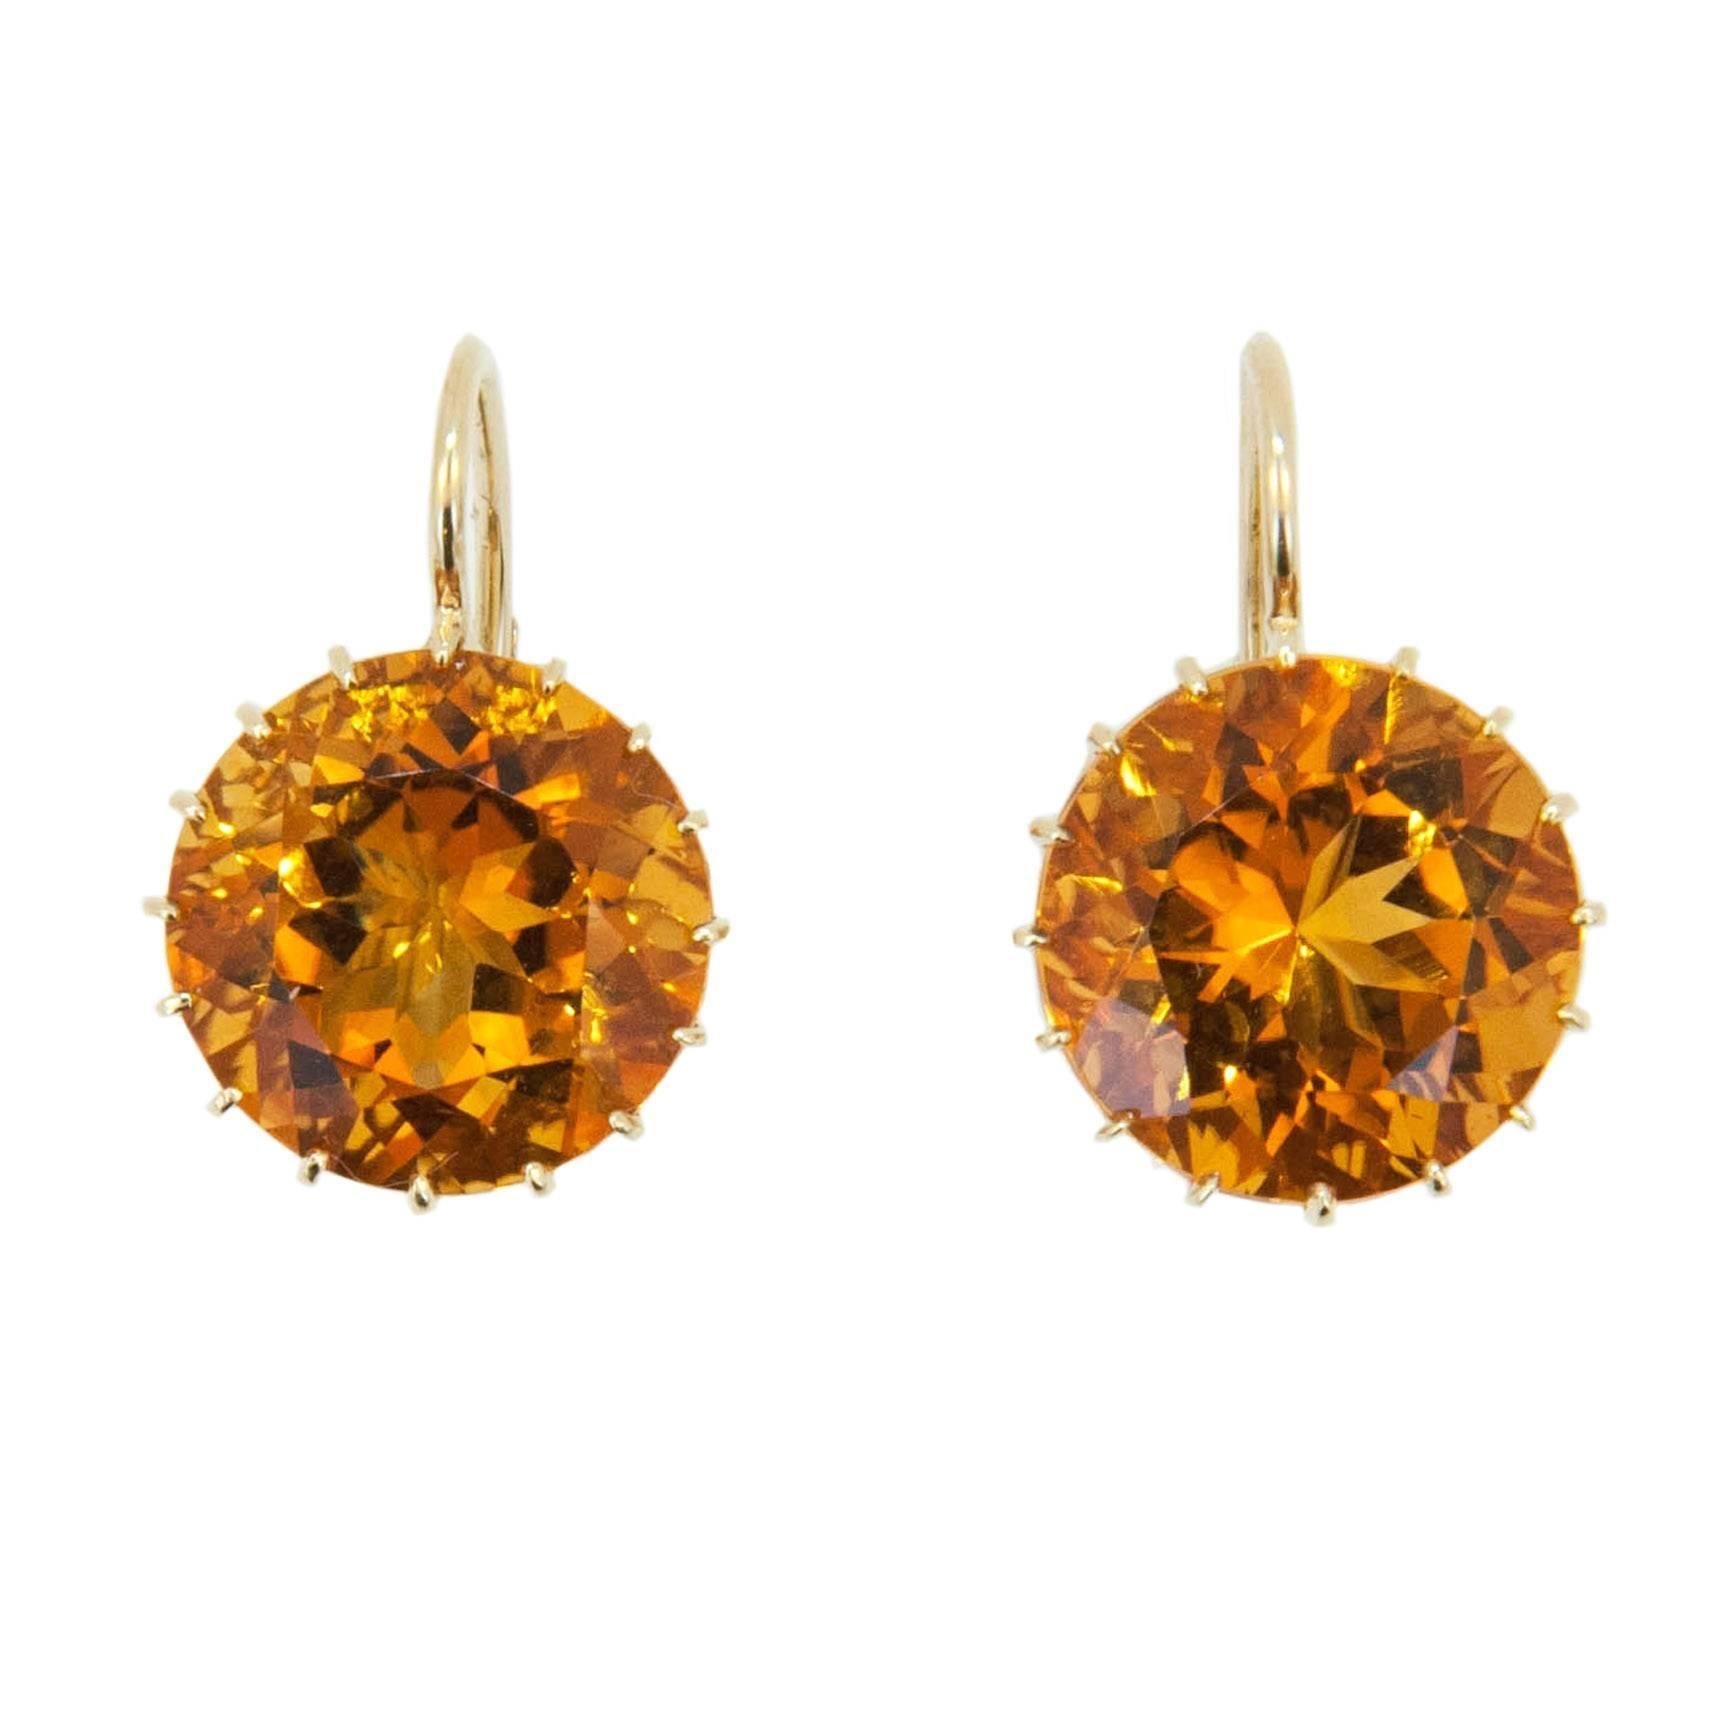 Laura Munder 13.9 millimeter Honey Citrine Drops on a Wire Gold Earrings